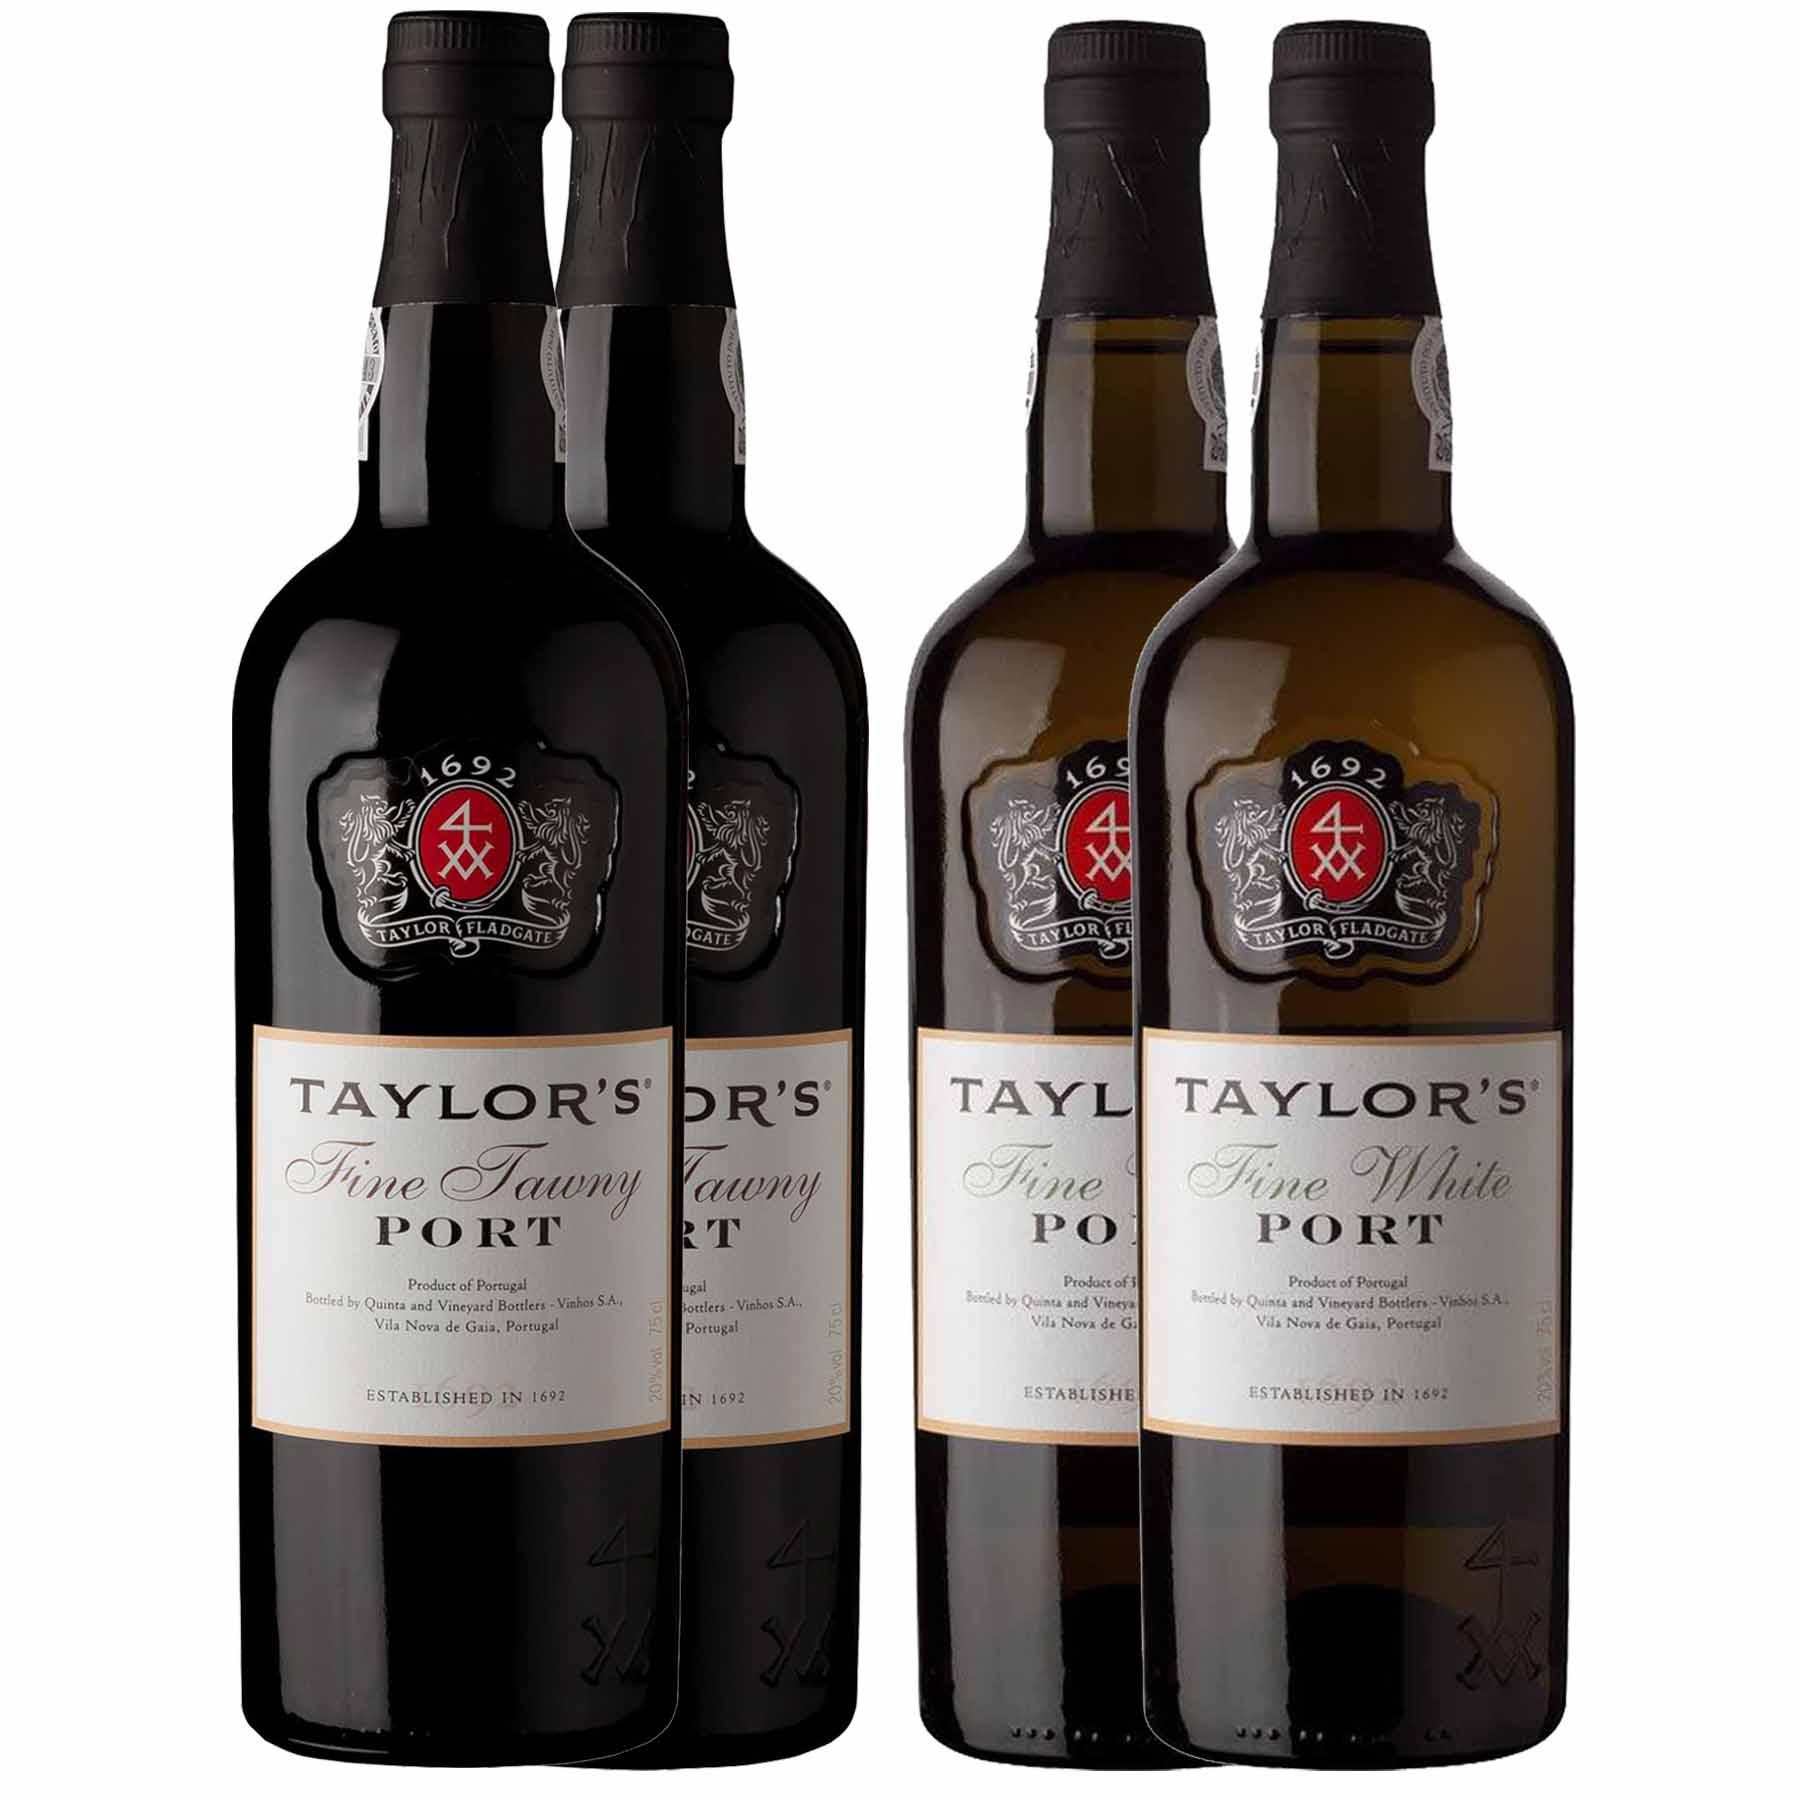 Kit 4x Vinho do Porto Taylor's White Fine + Tawny 750ml